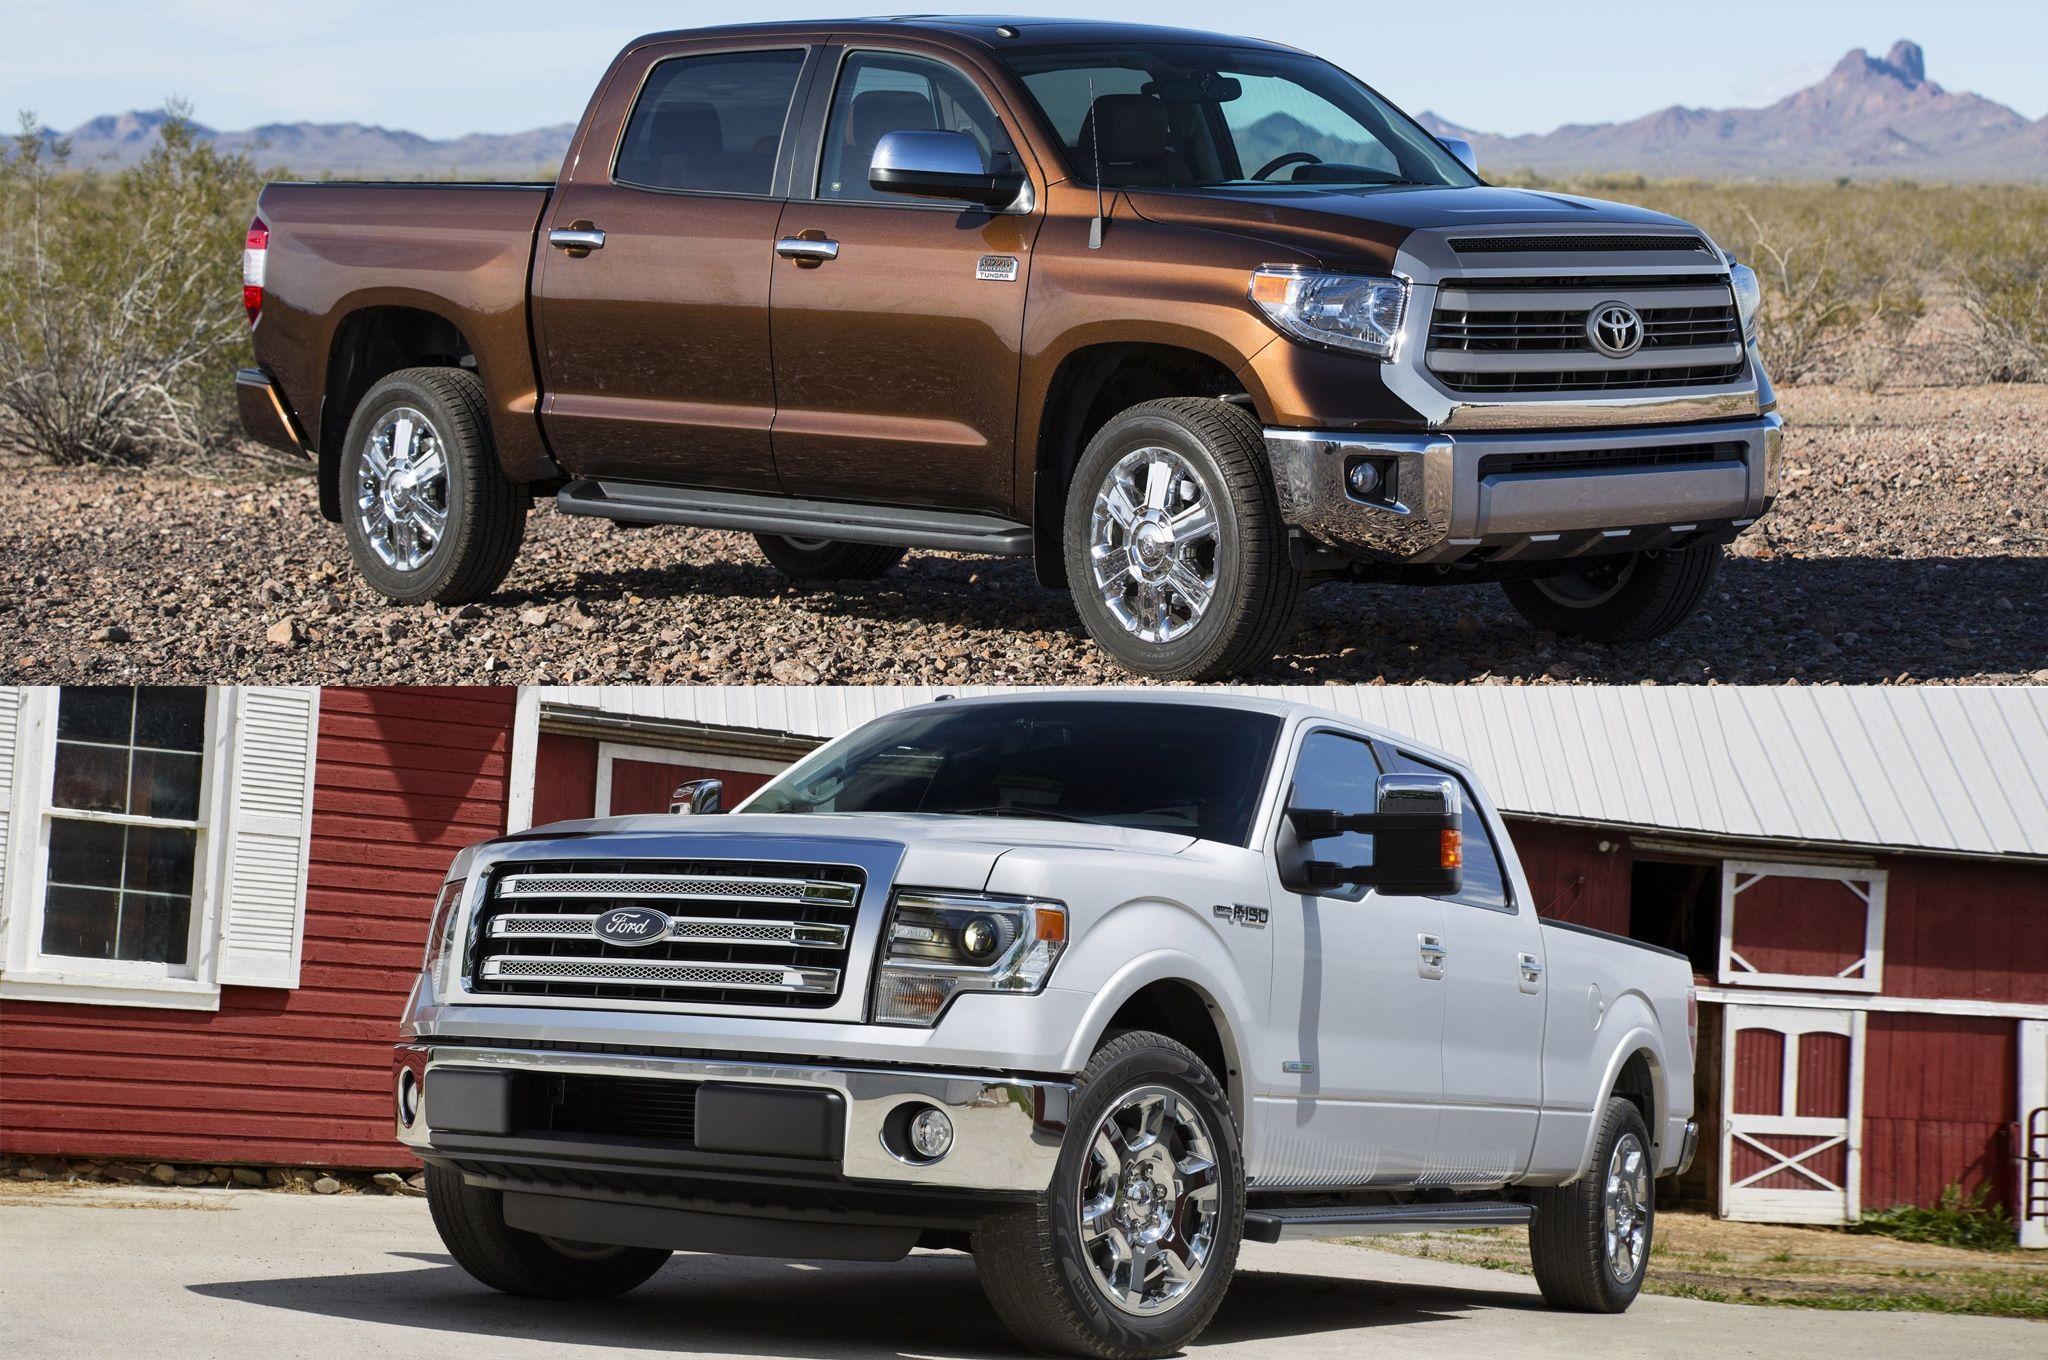 2014 ford f 150 vs 2014 toyota tundra